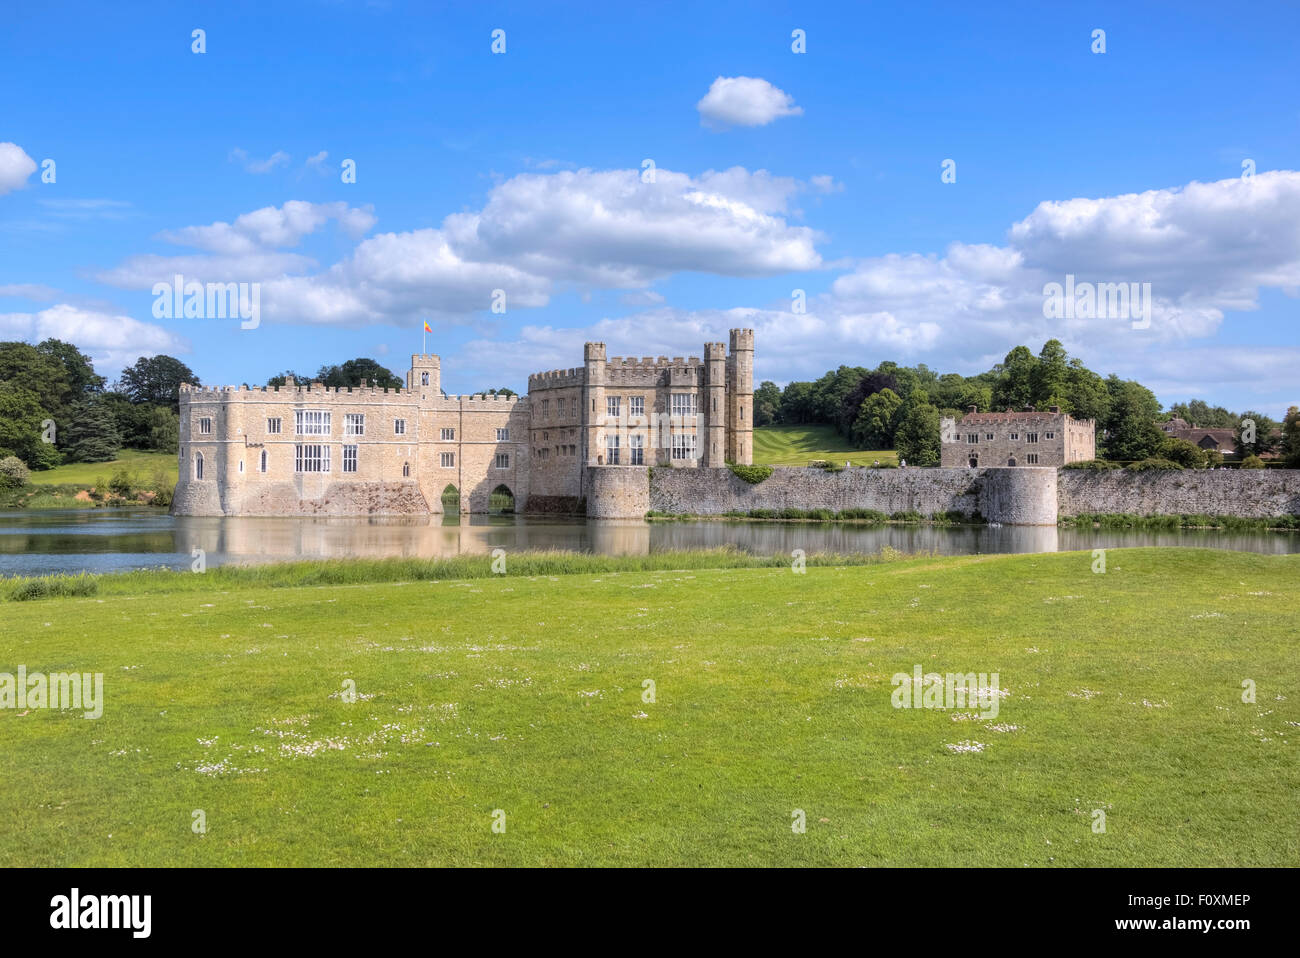 Castillo de Leeds, Maidstone, Kent, Inglaterra, Reino Unido Imagen De Stock